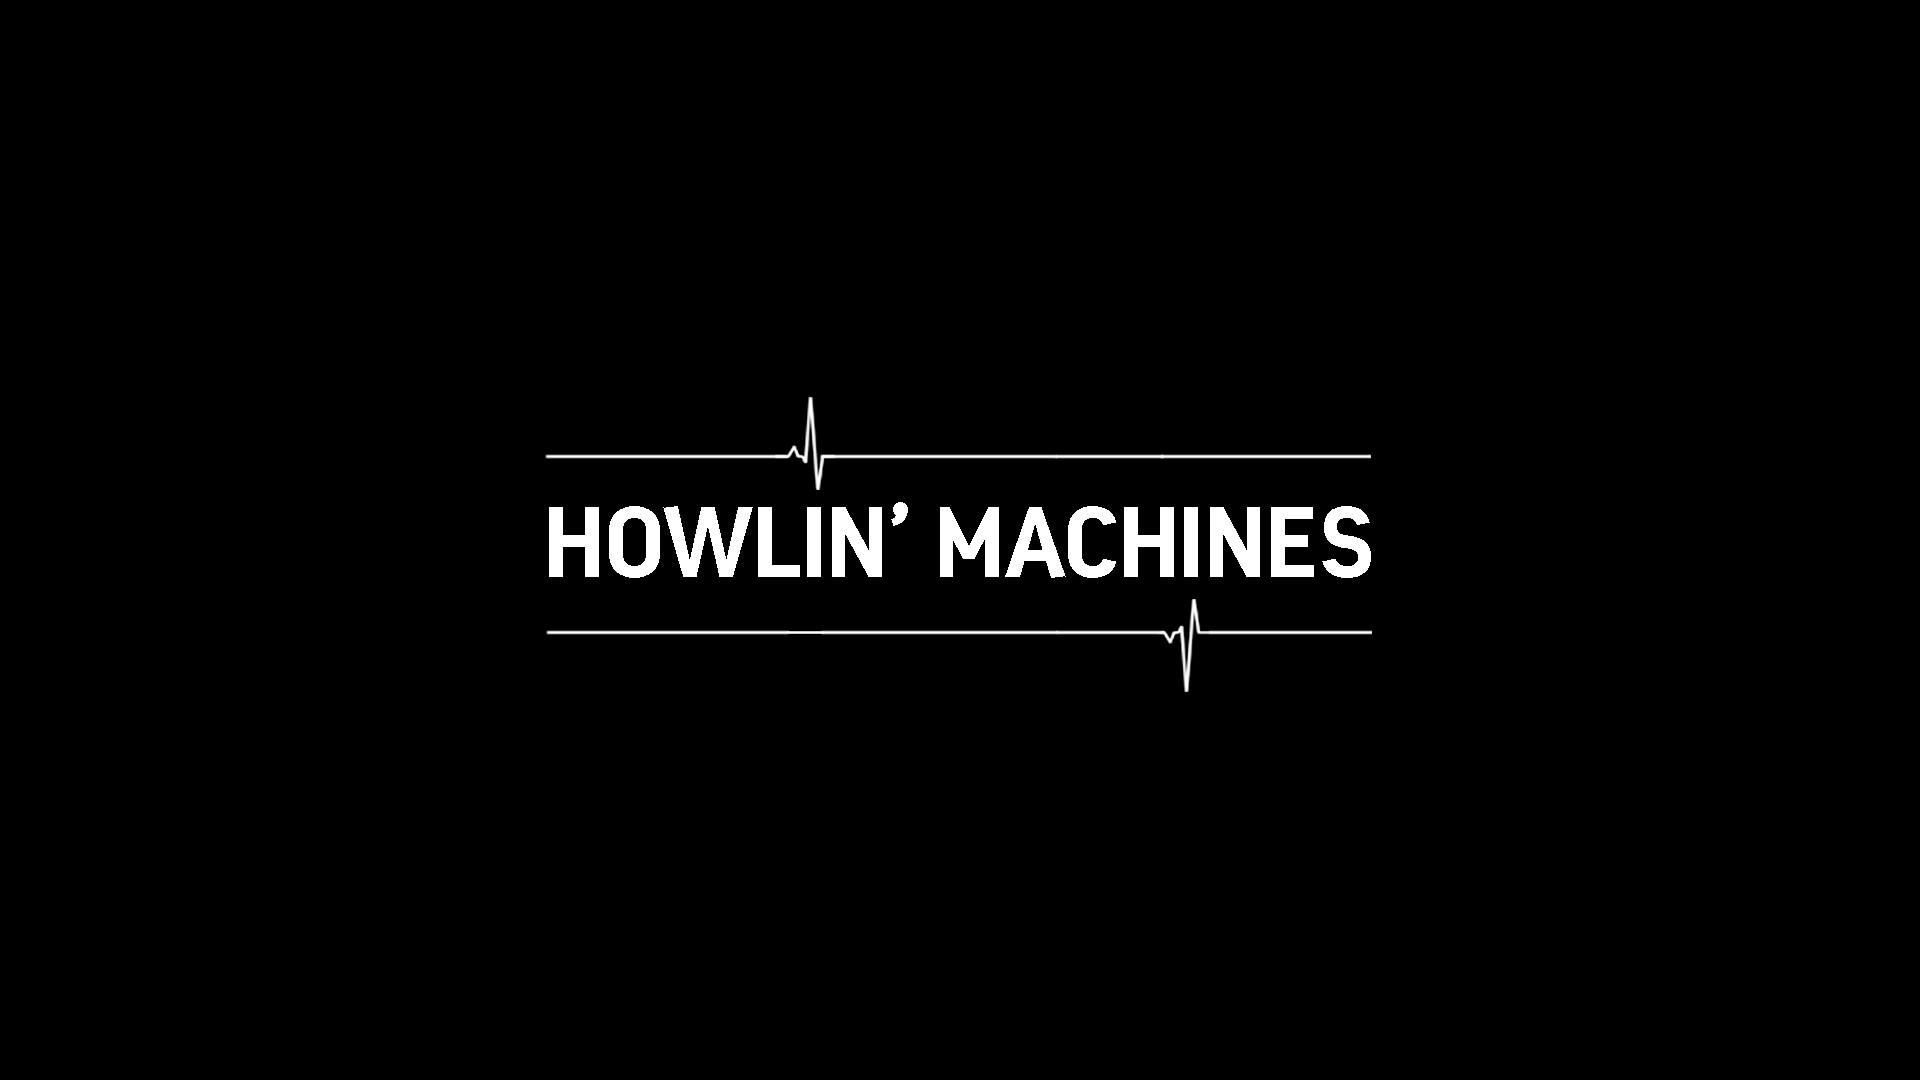 stoner rock,howlin' machines, nouvel album, 2017, black sabbath, motorhead